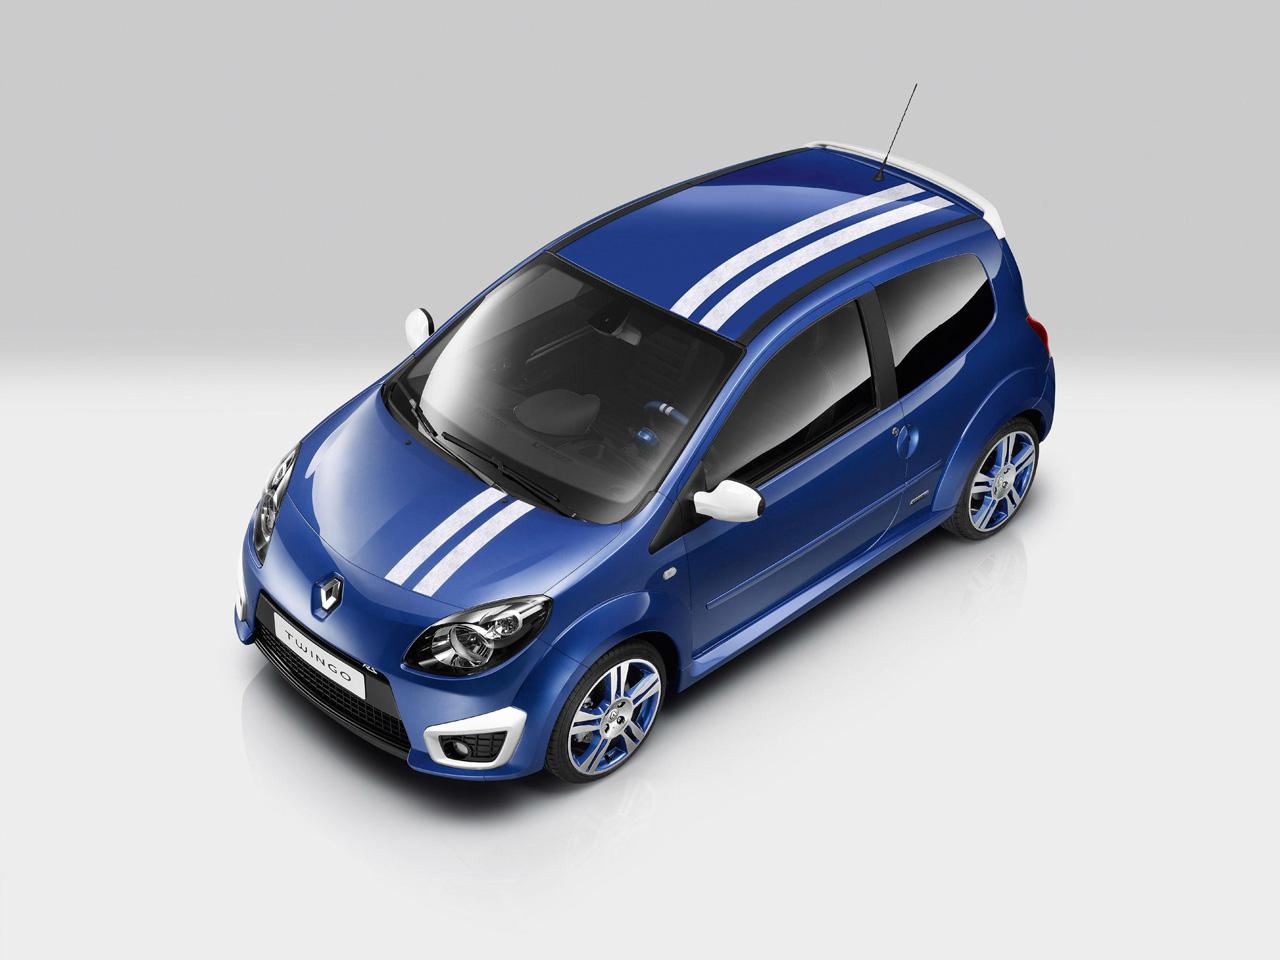 http://1.bp.blogspot.com/_J3_liDBfbvs/SxEtbFMZP4I/AAAAAAAARRo/9JyDJngOclM/s1600/2010-Renault-Twingo-Gordini-RS-Image.jpg